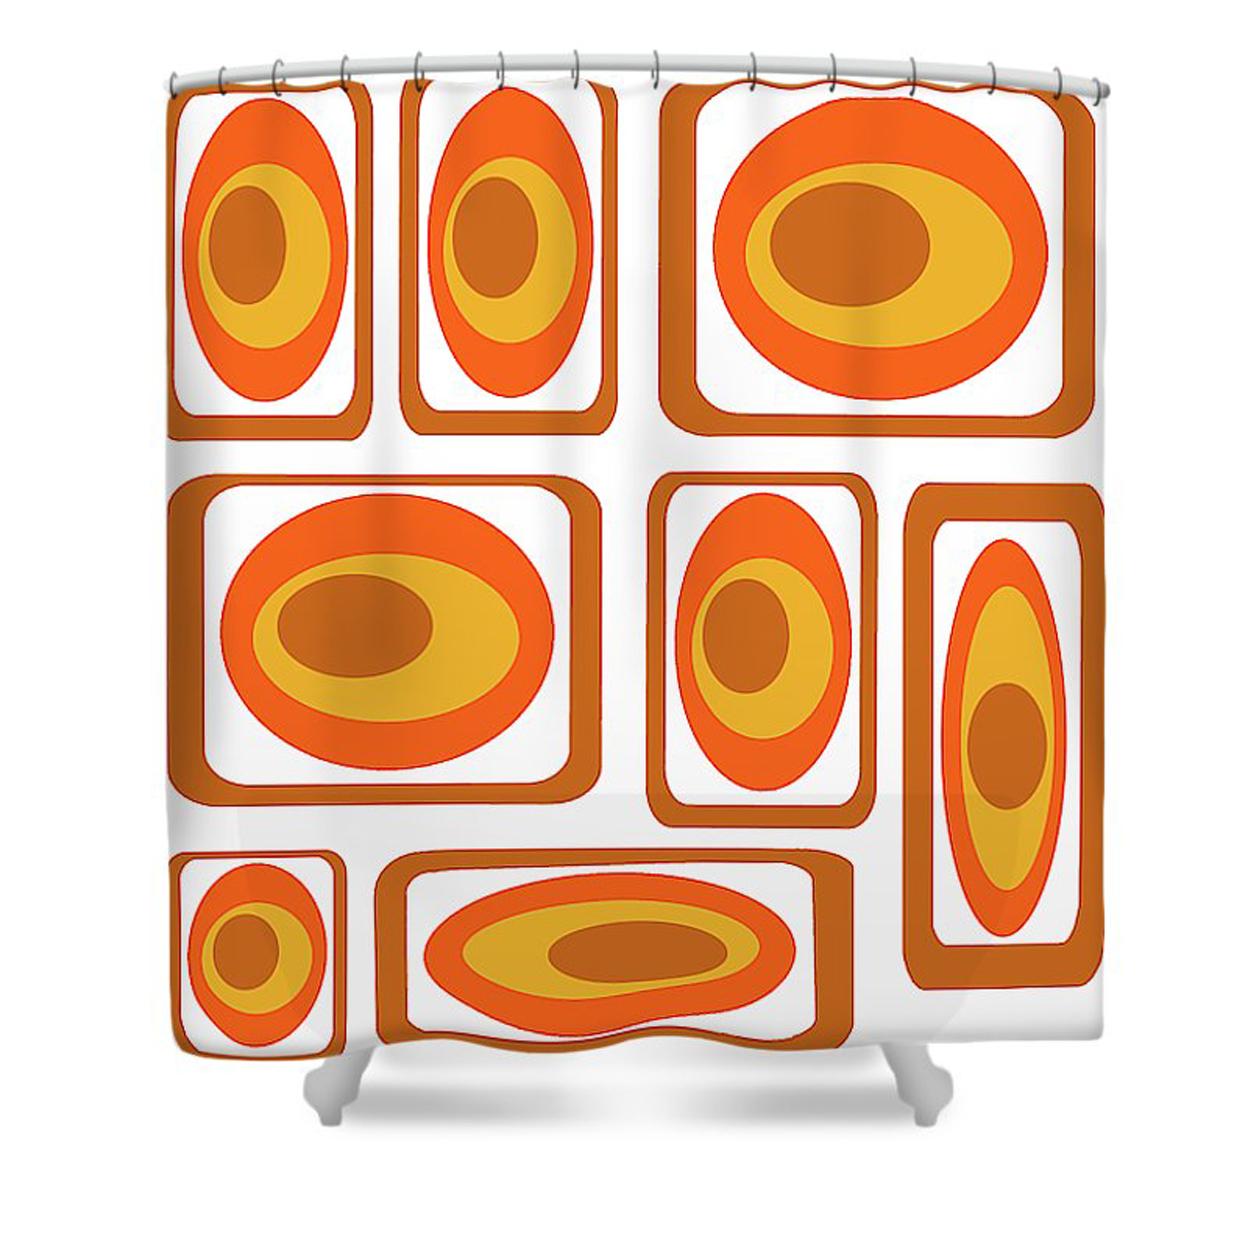 Shower Curtain - Crash Pad Designs Ollie